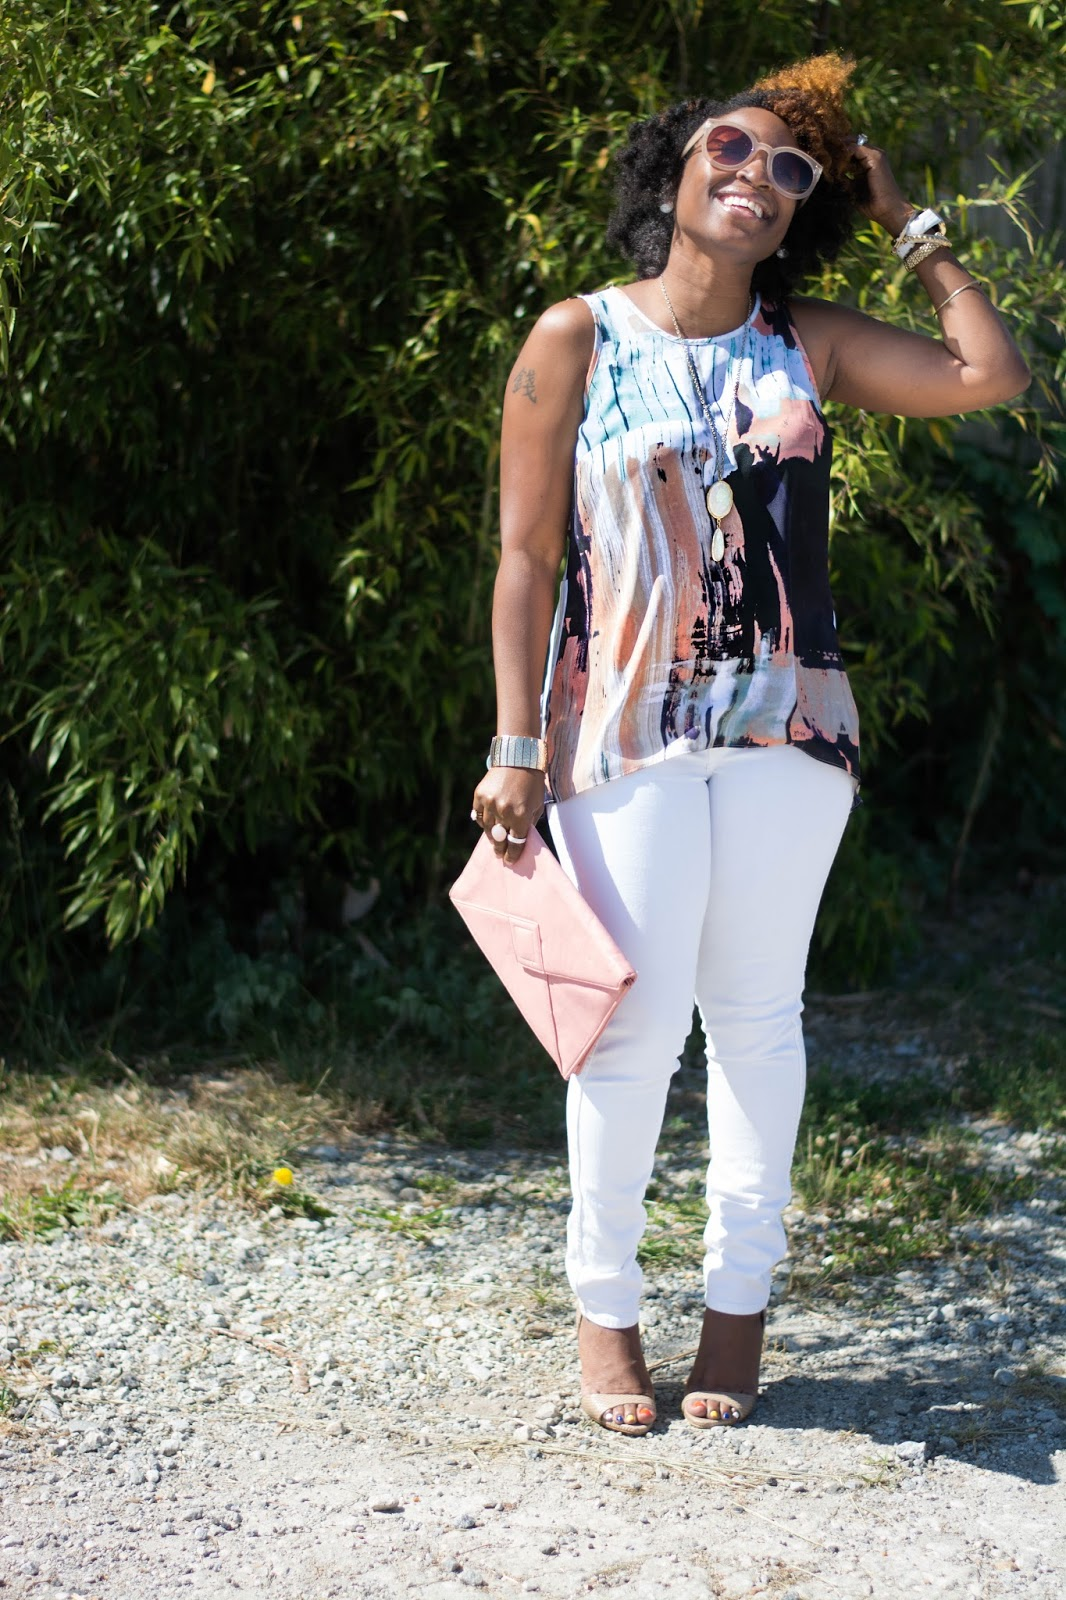 Atlanta style influencer, Atlanta blogger, Atlanta Stylist, Atlanta street fashion, street style, black girl rock, black girl magic, natural girls rock, natural hair, 4c hair chick, thrifted fashion, hm skinny jeans, black blogger, brown girl blogger, shoedazzle, fashion blogger, stylist, black girls killing it, mossimo, aldo sunnies, nude heels, white jeans, petite style